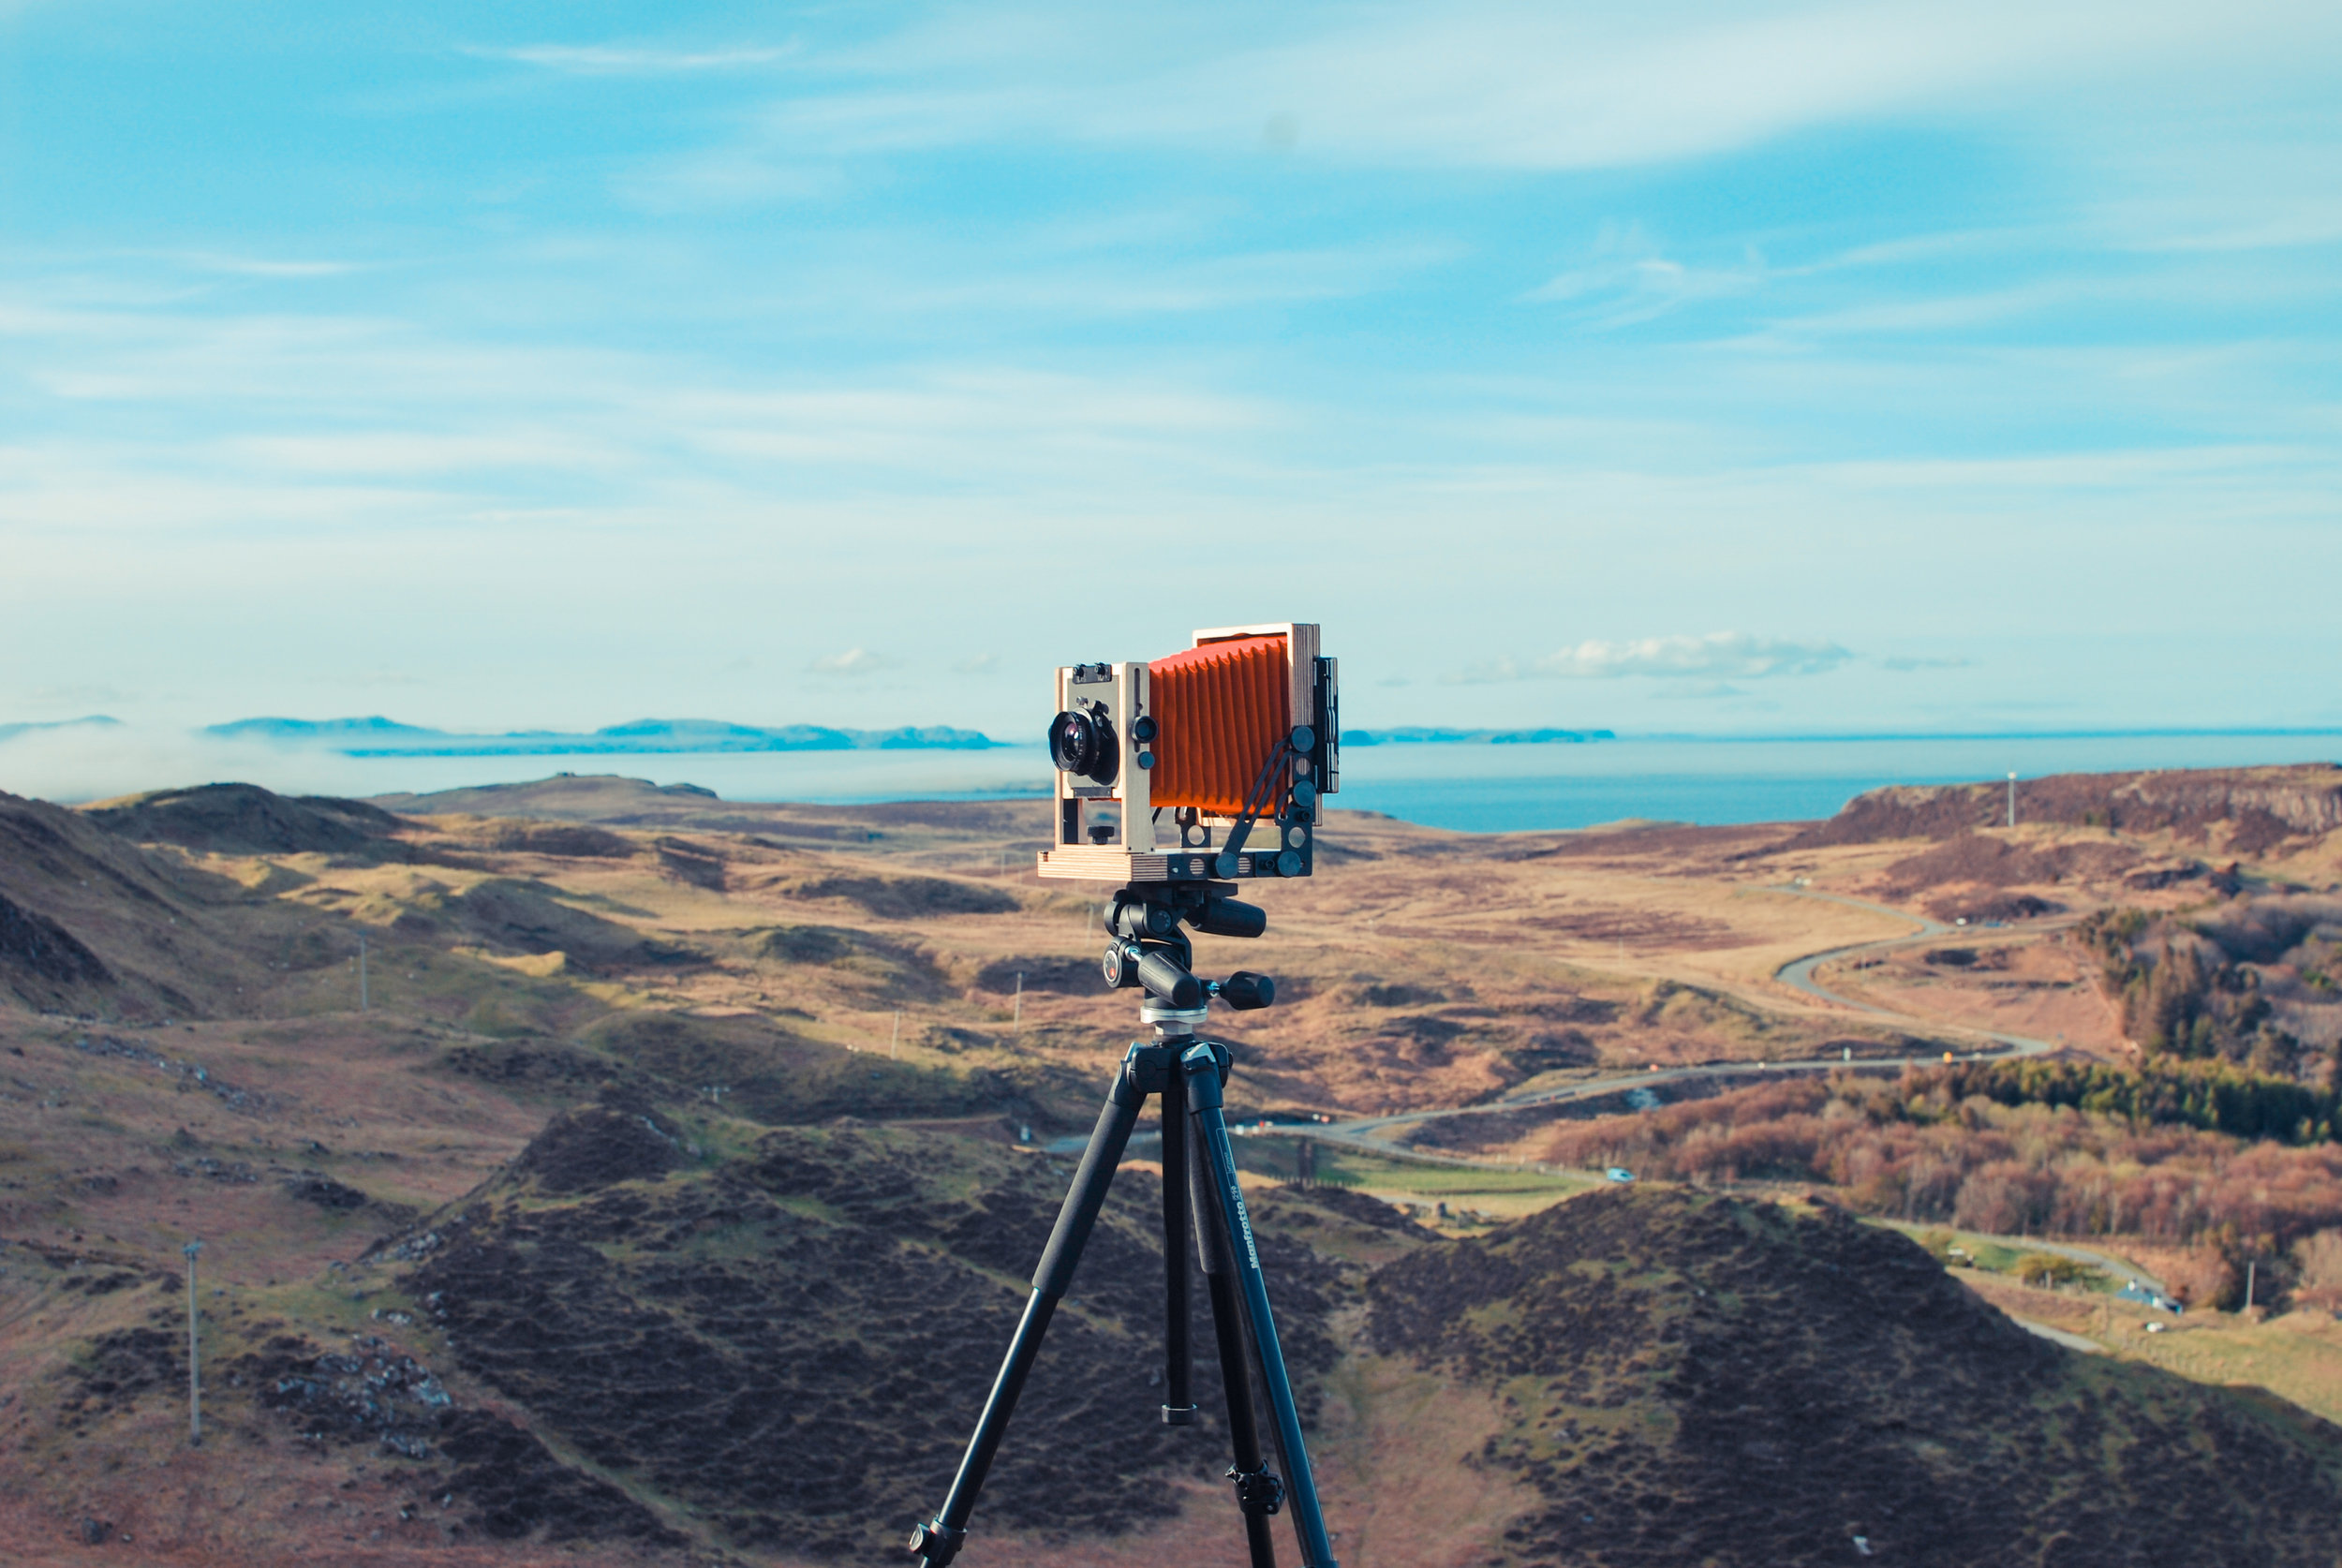 My new camera - The Intrepid 4x5